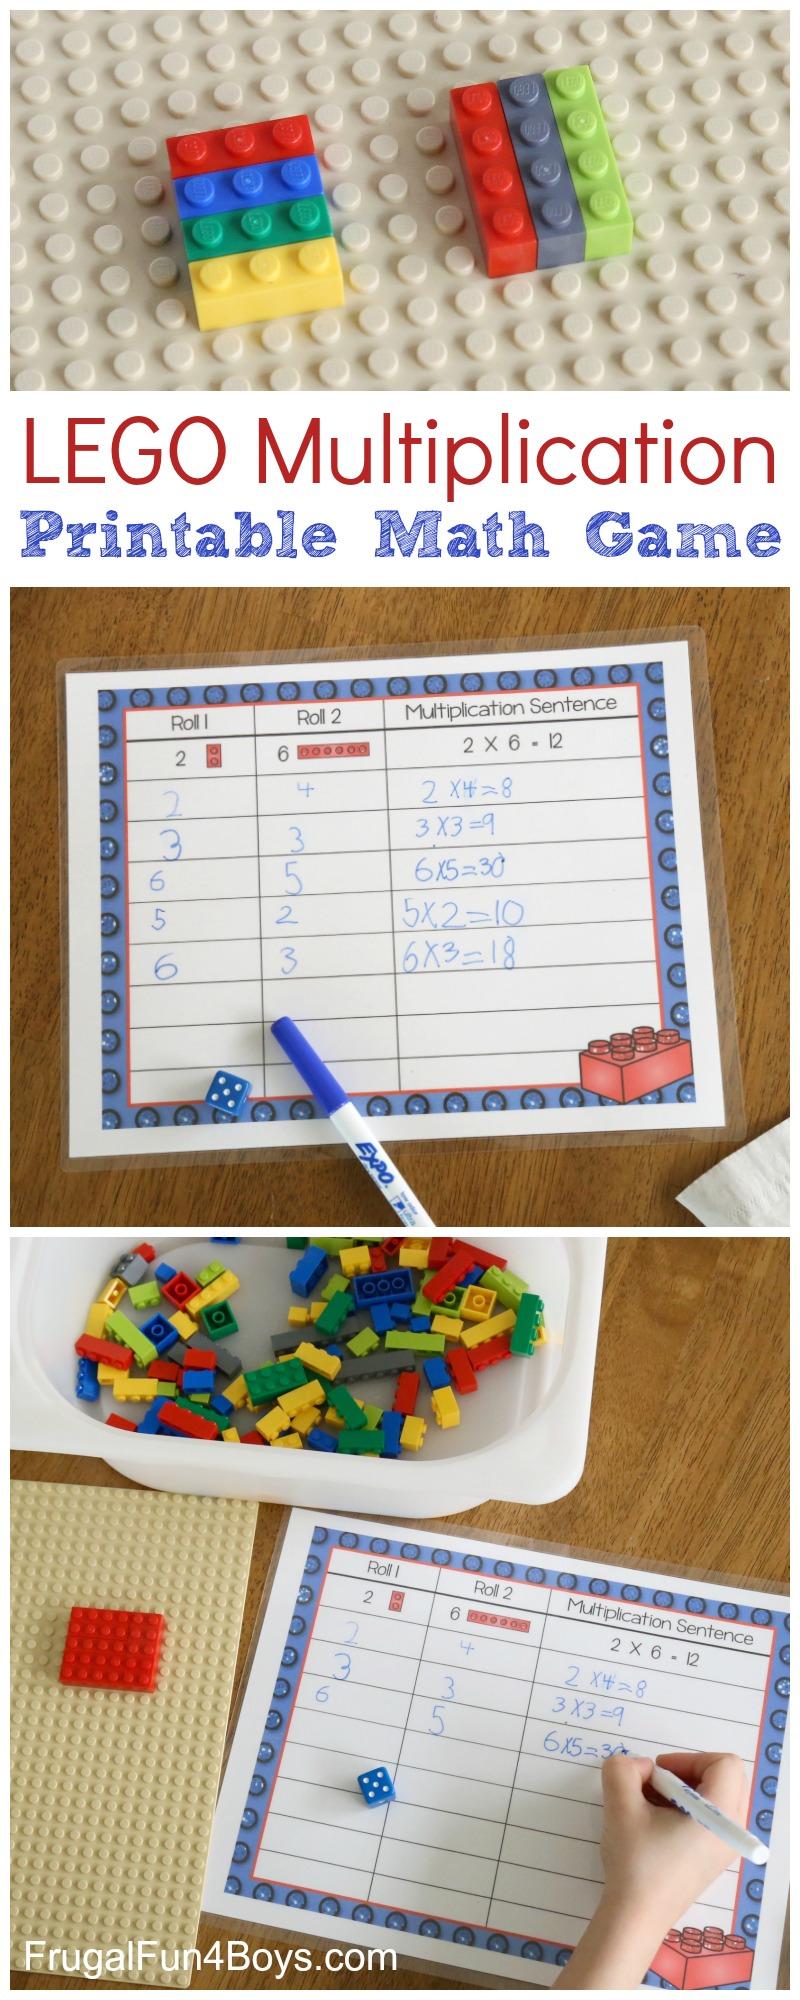 LEGO Multiplication! Printable Math Activity